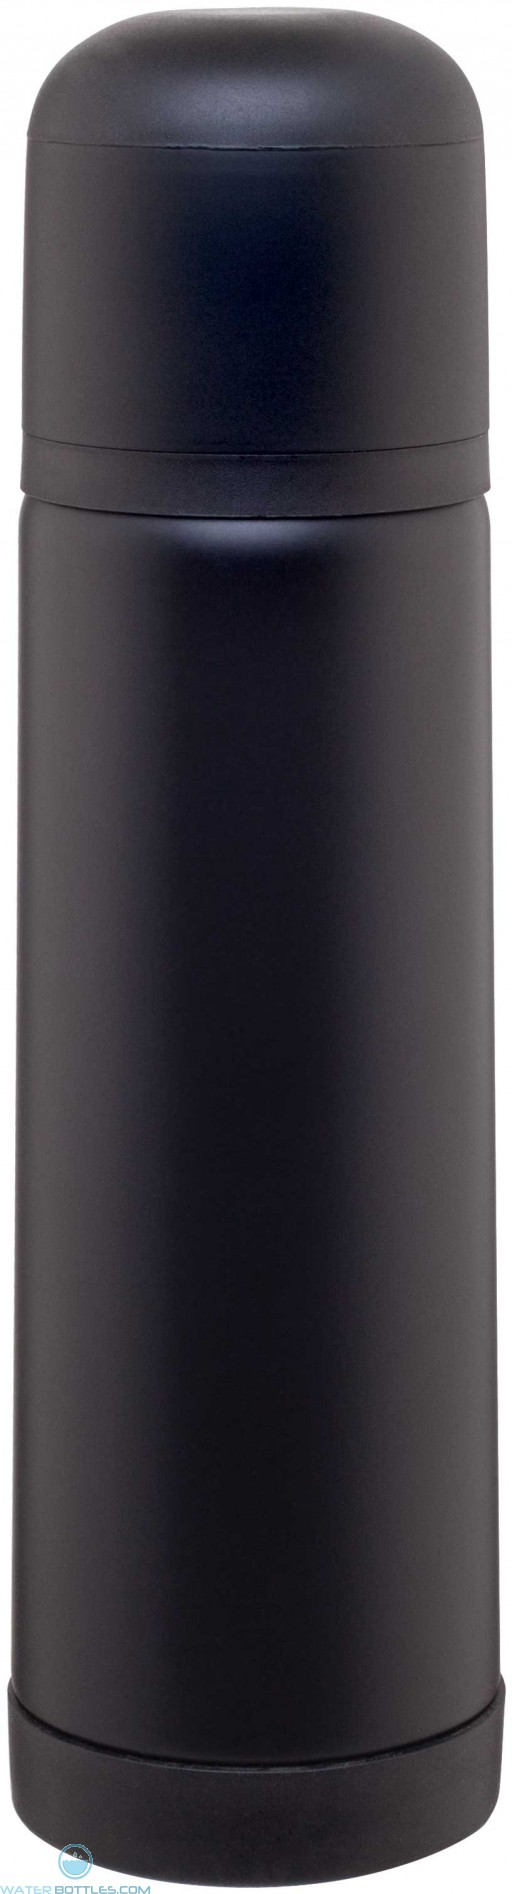 Vacuum Thermal Bottles | 25 oz - Matte Black